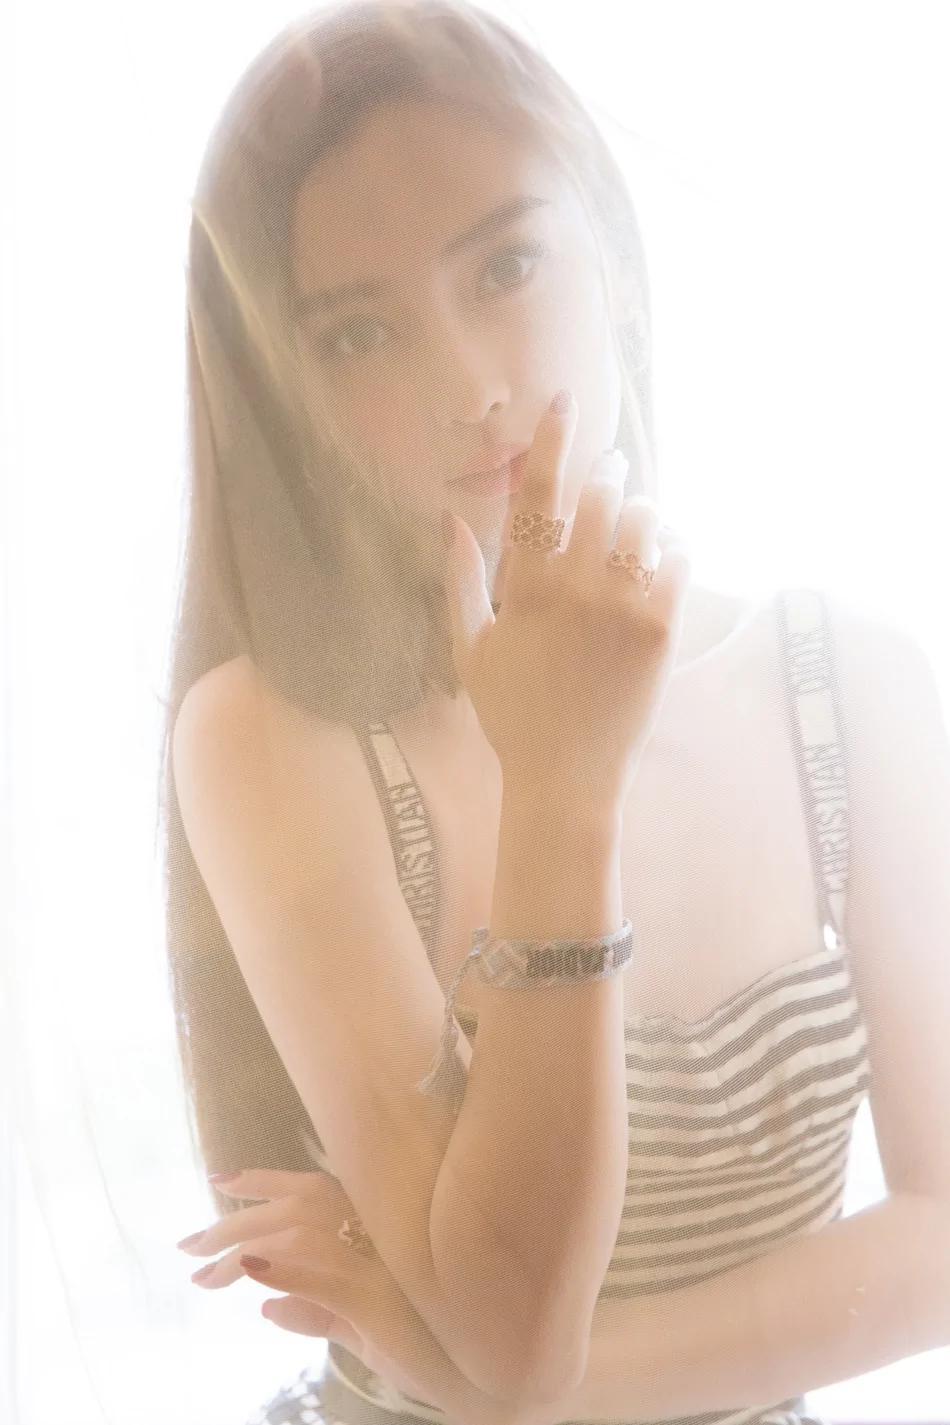 Angelababy條紋百褶紗裙甜美夢幻 盡顯少女心